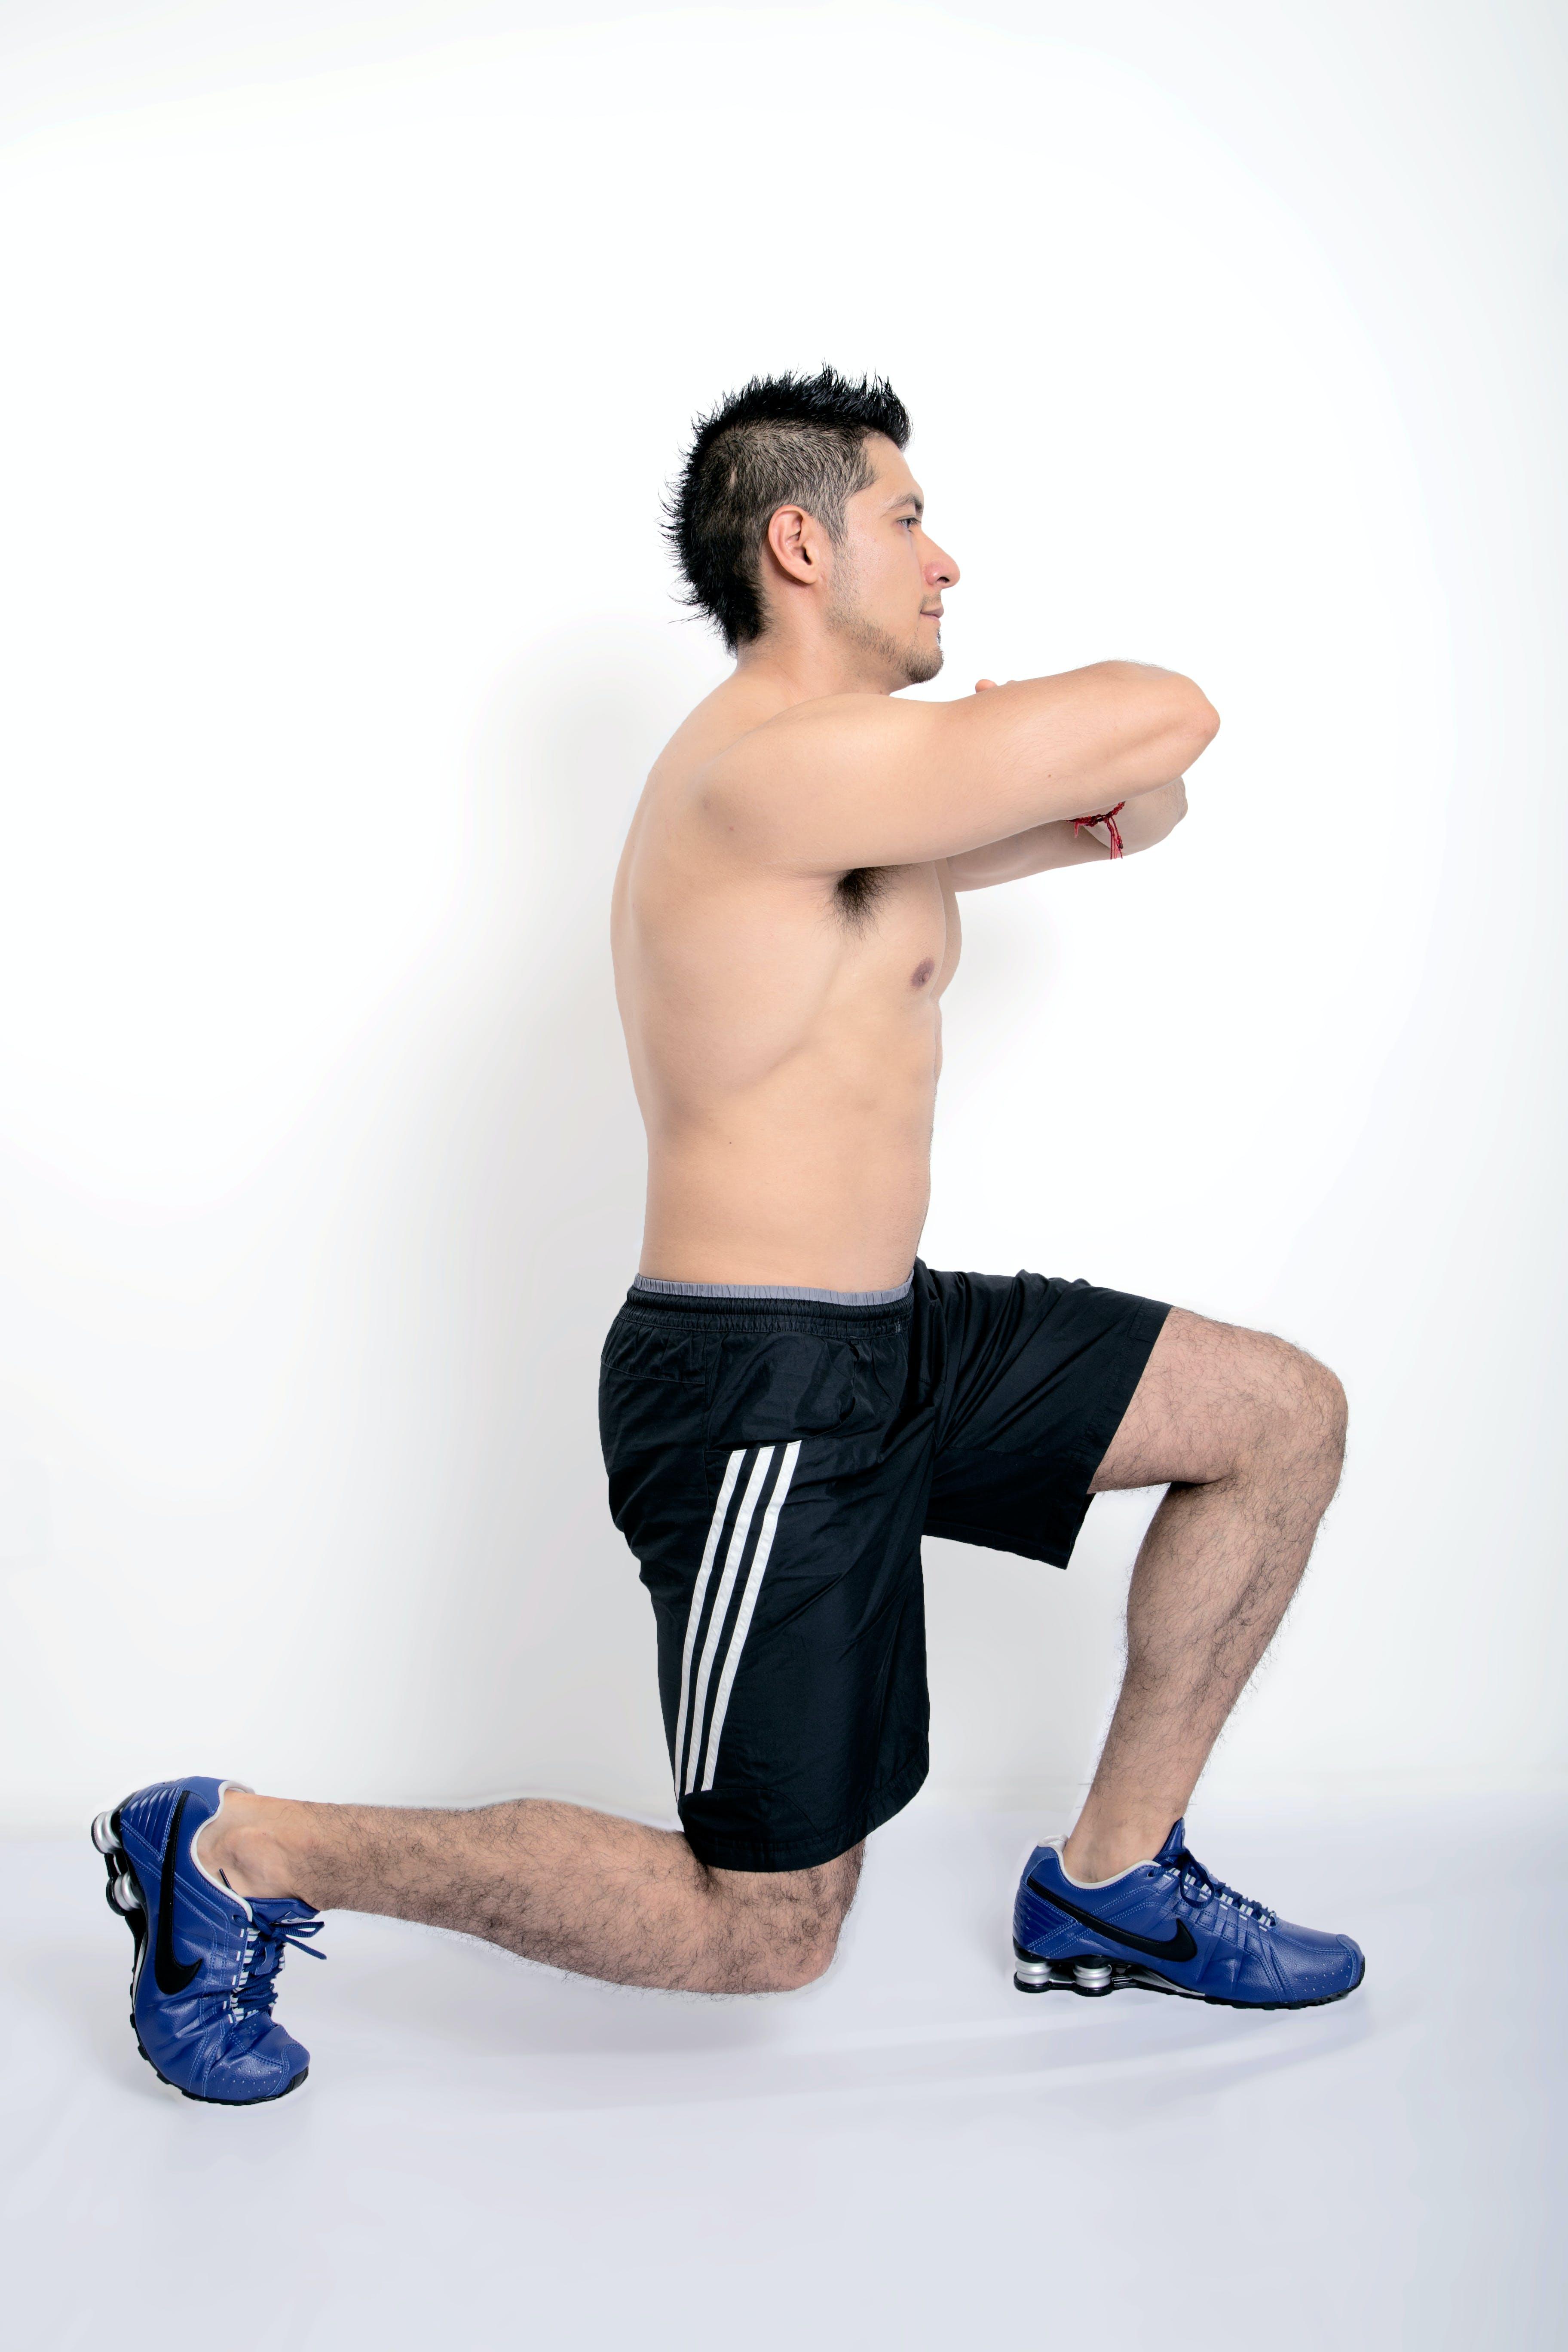 Kostenloses Stock Foto zu fitness, model, sport, sportbekleidung